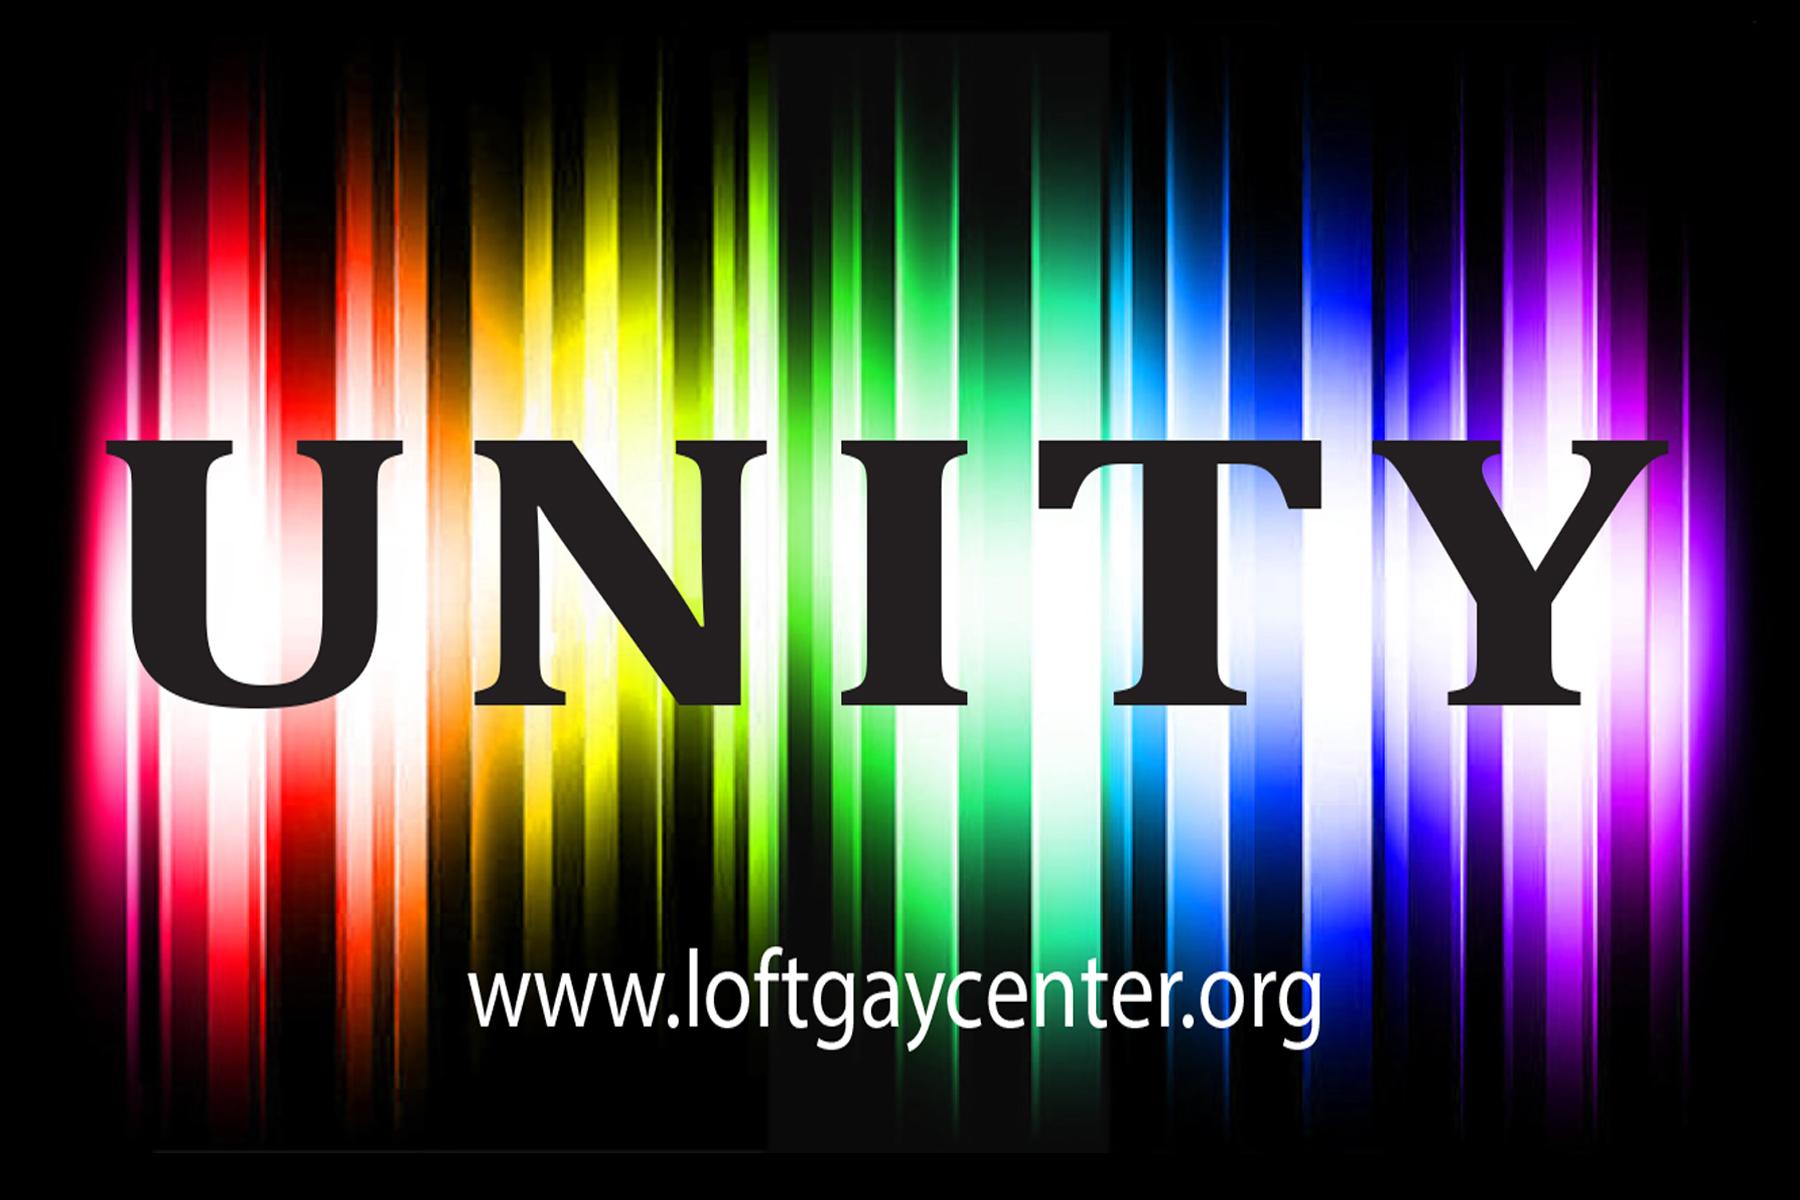 UNITY_Static_Sticker.jpg